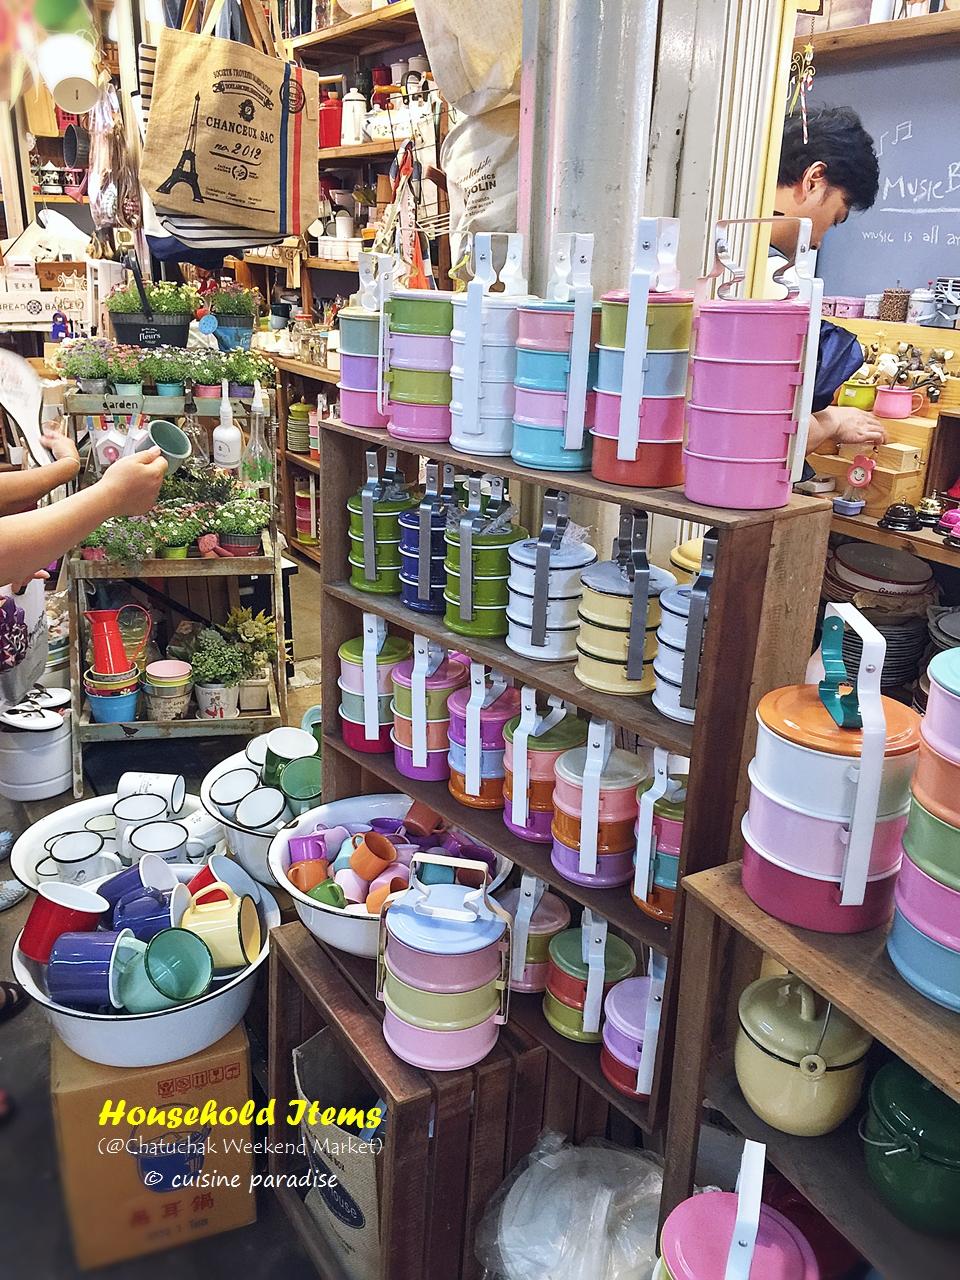 Bkk-Chatuchak Market - Google My Maps